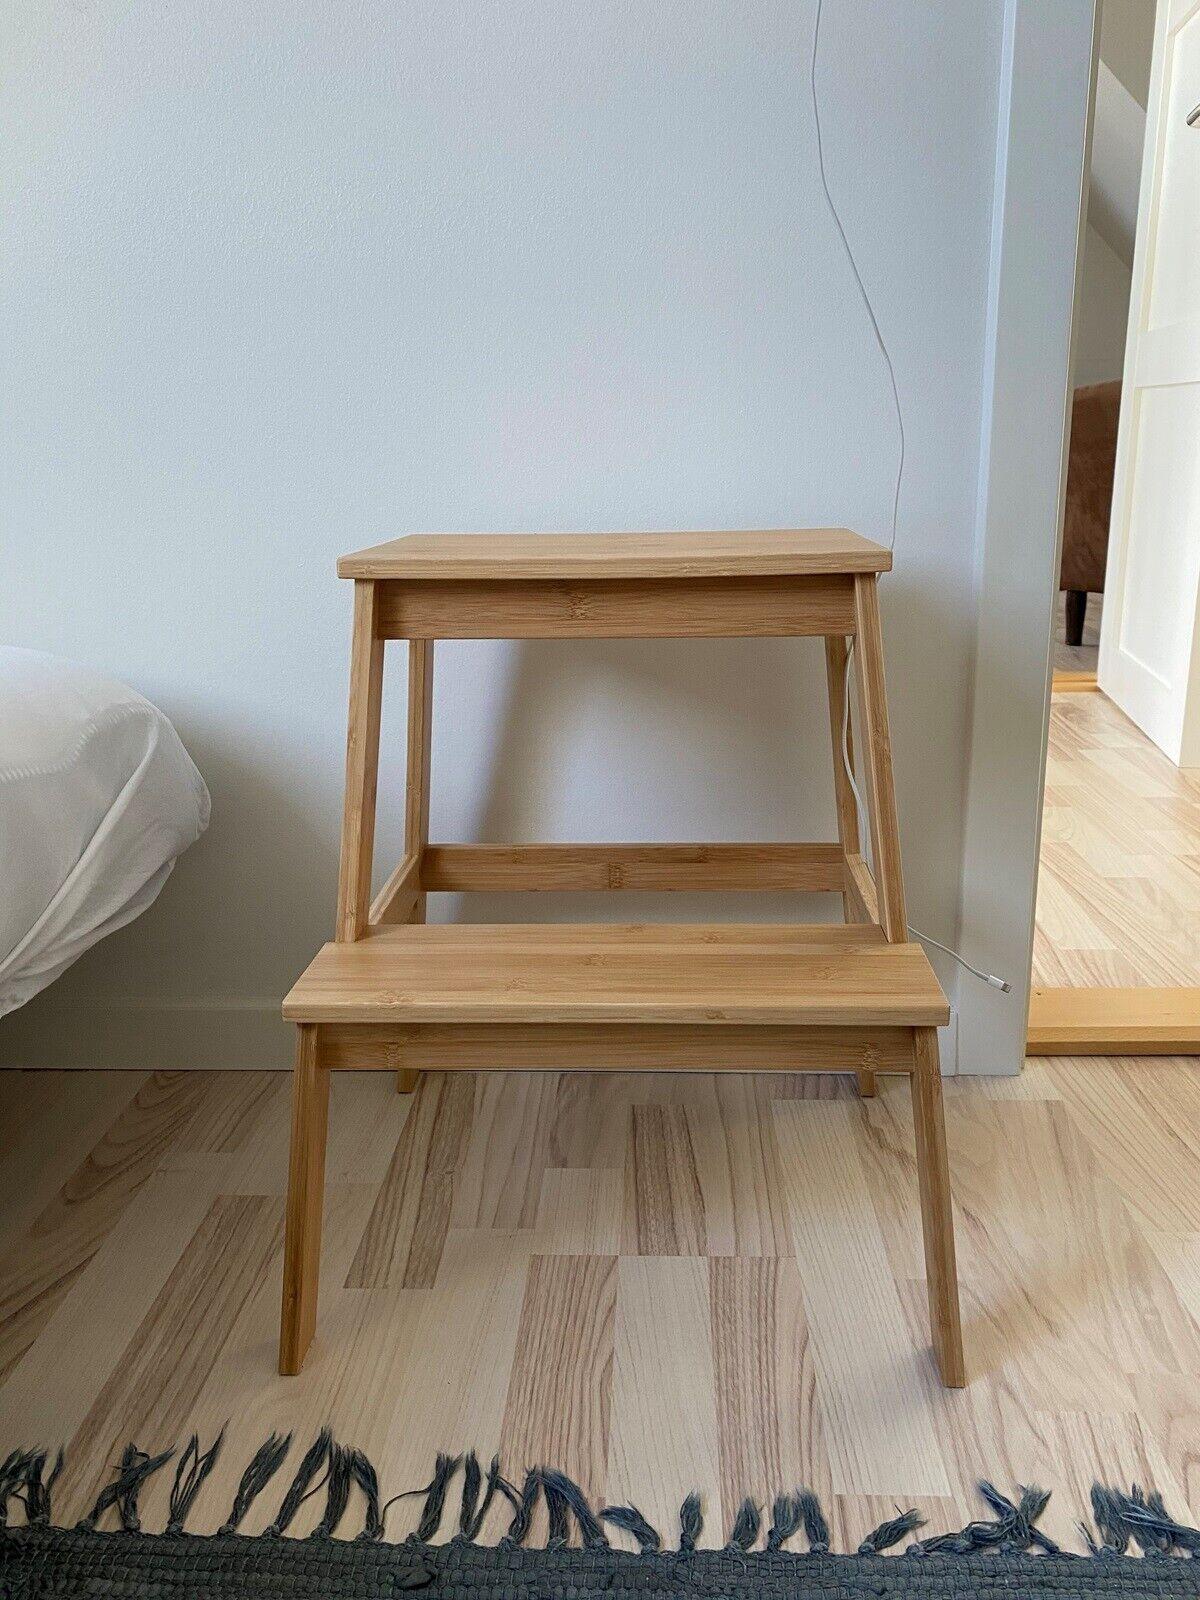 Picture of: Tenhult Taburet Bambus Ikea